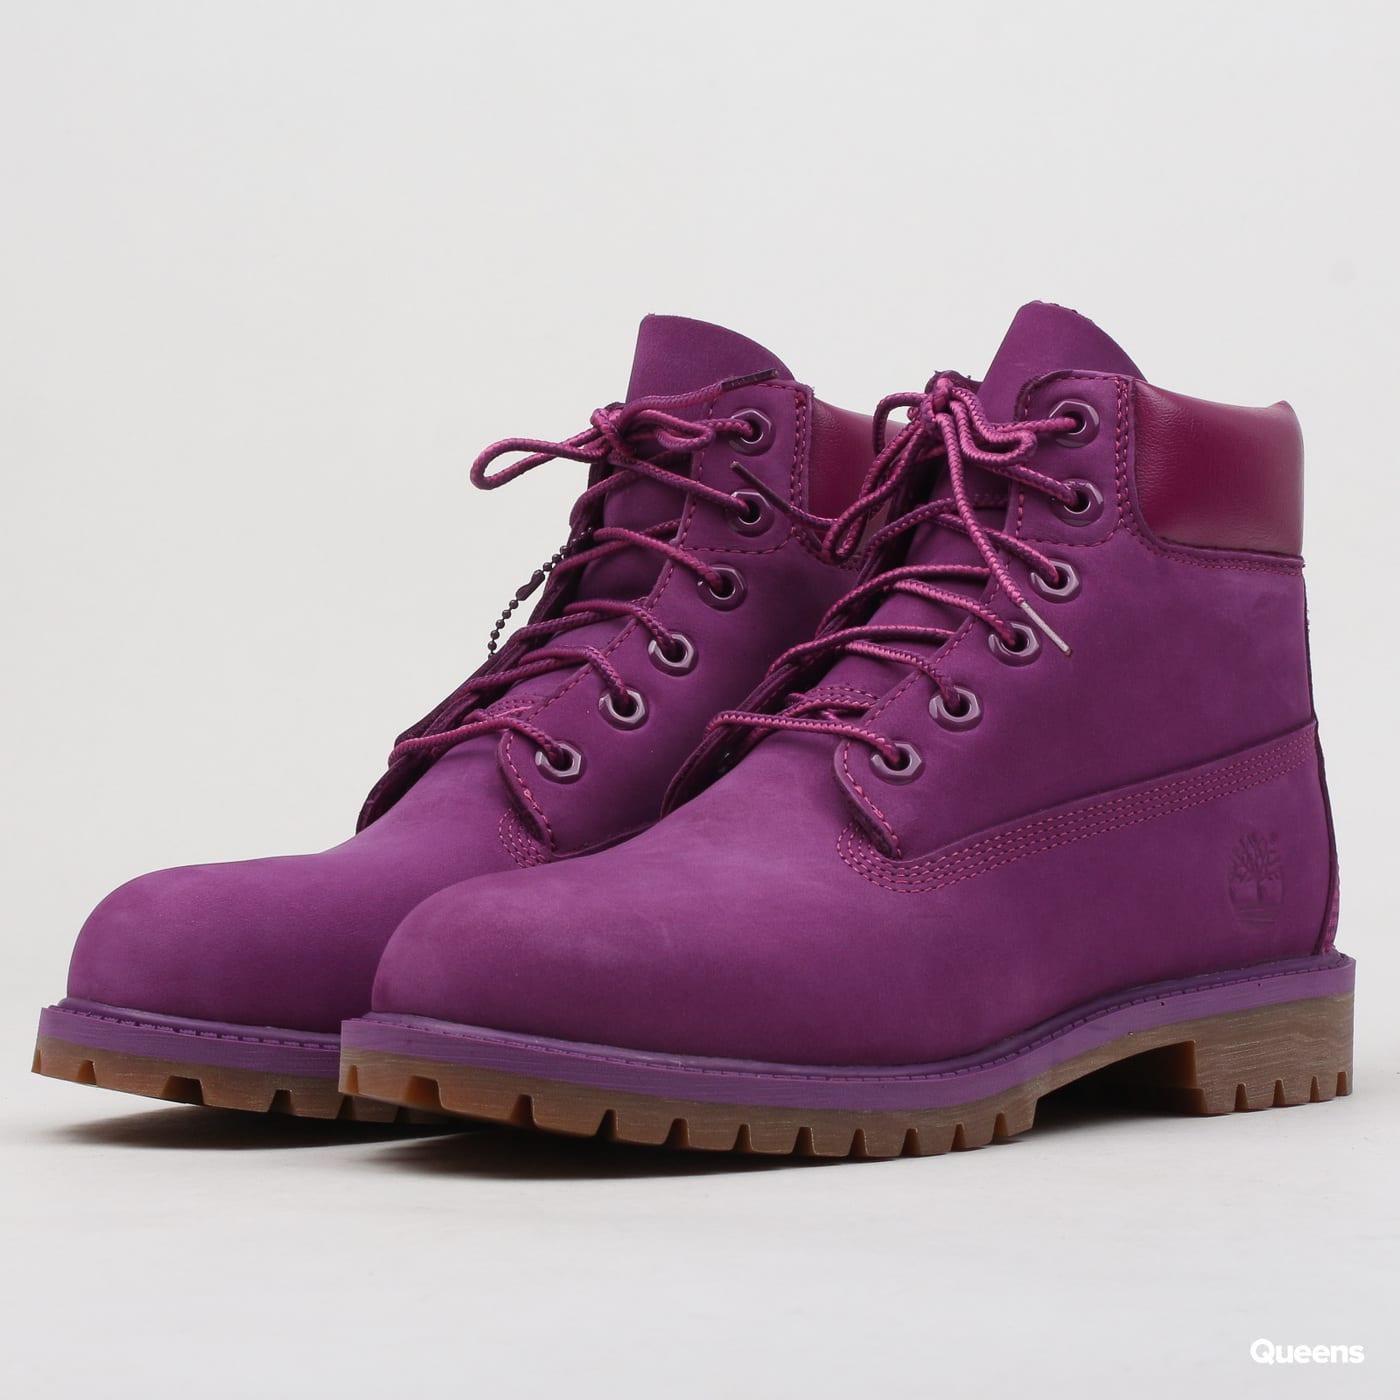 Dámské zimní boty Timberland 6 Inch Premium WP Boot (A1VAZ - GRN) – Queens  💚 47d373eaeb